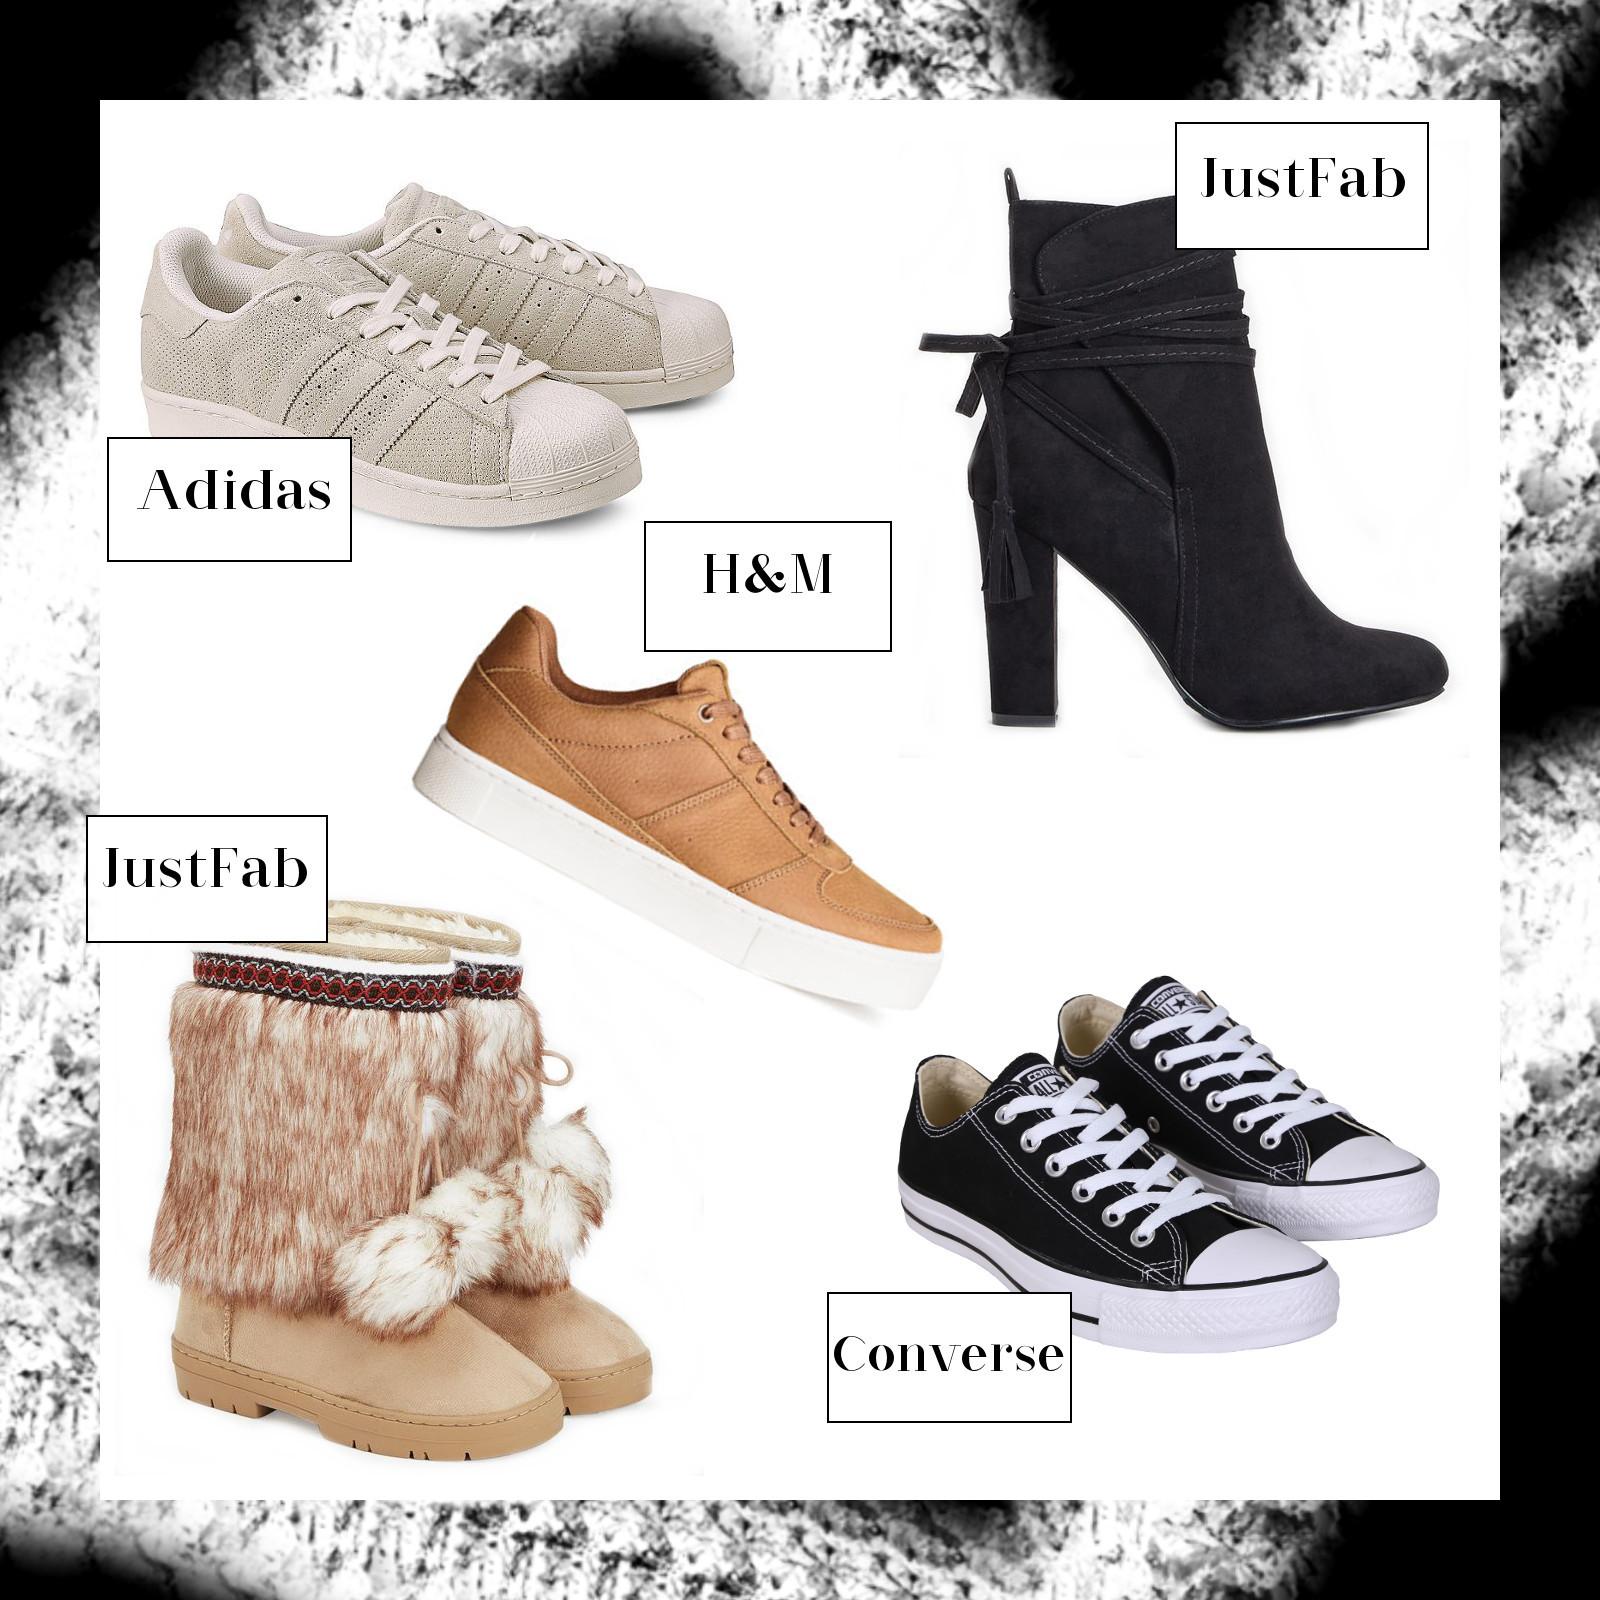 Schuh Neuheiten, September Favoriten 2016, Monatsrückblick, Adidas, Converse, JustFab, H&M, bezauberndenana.de